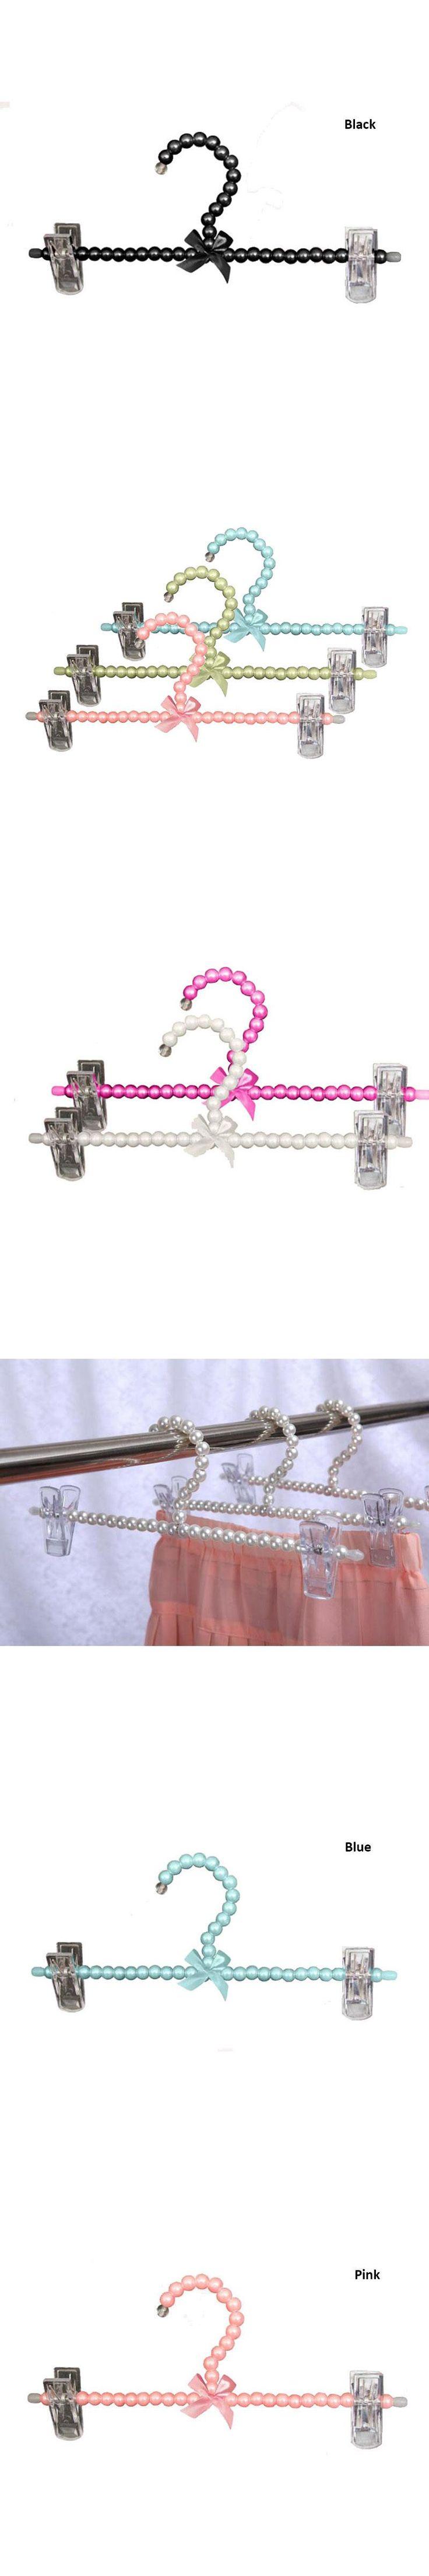 10 Pcs/ Lot Colorful Fancy Pearl Pants Skirt Hanger with Clips, Plastic Wedding Dress Bottom Hanger for Lady Girl